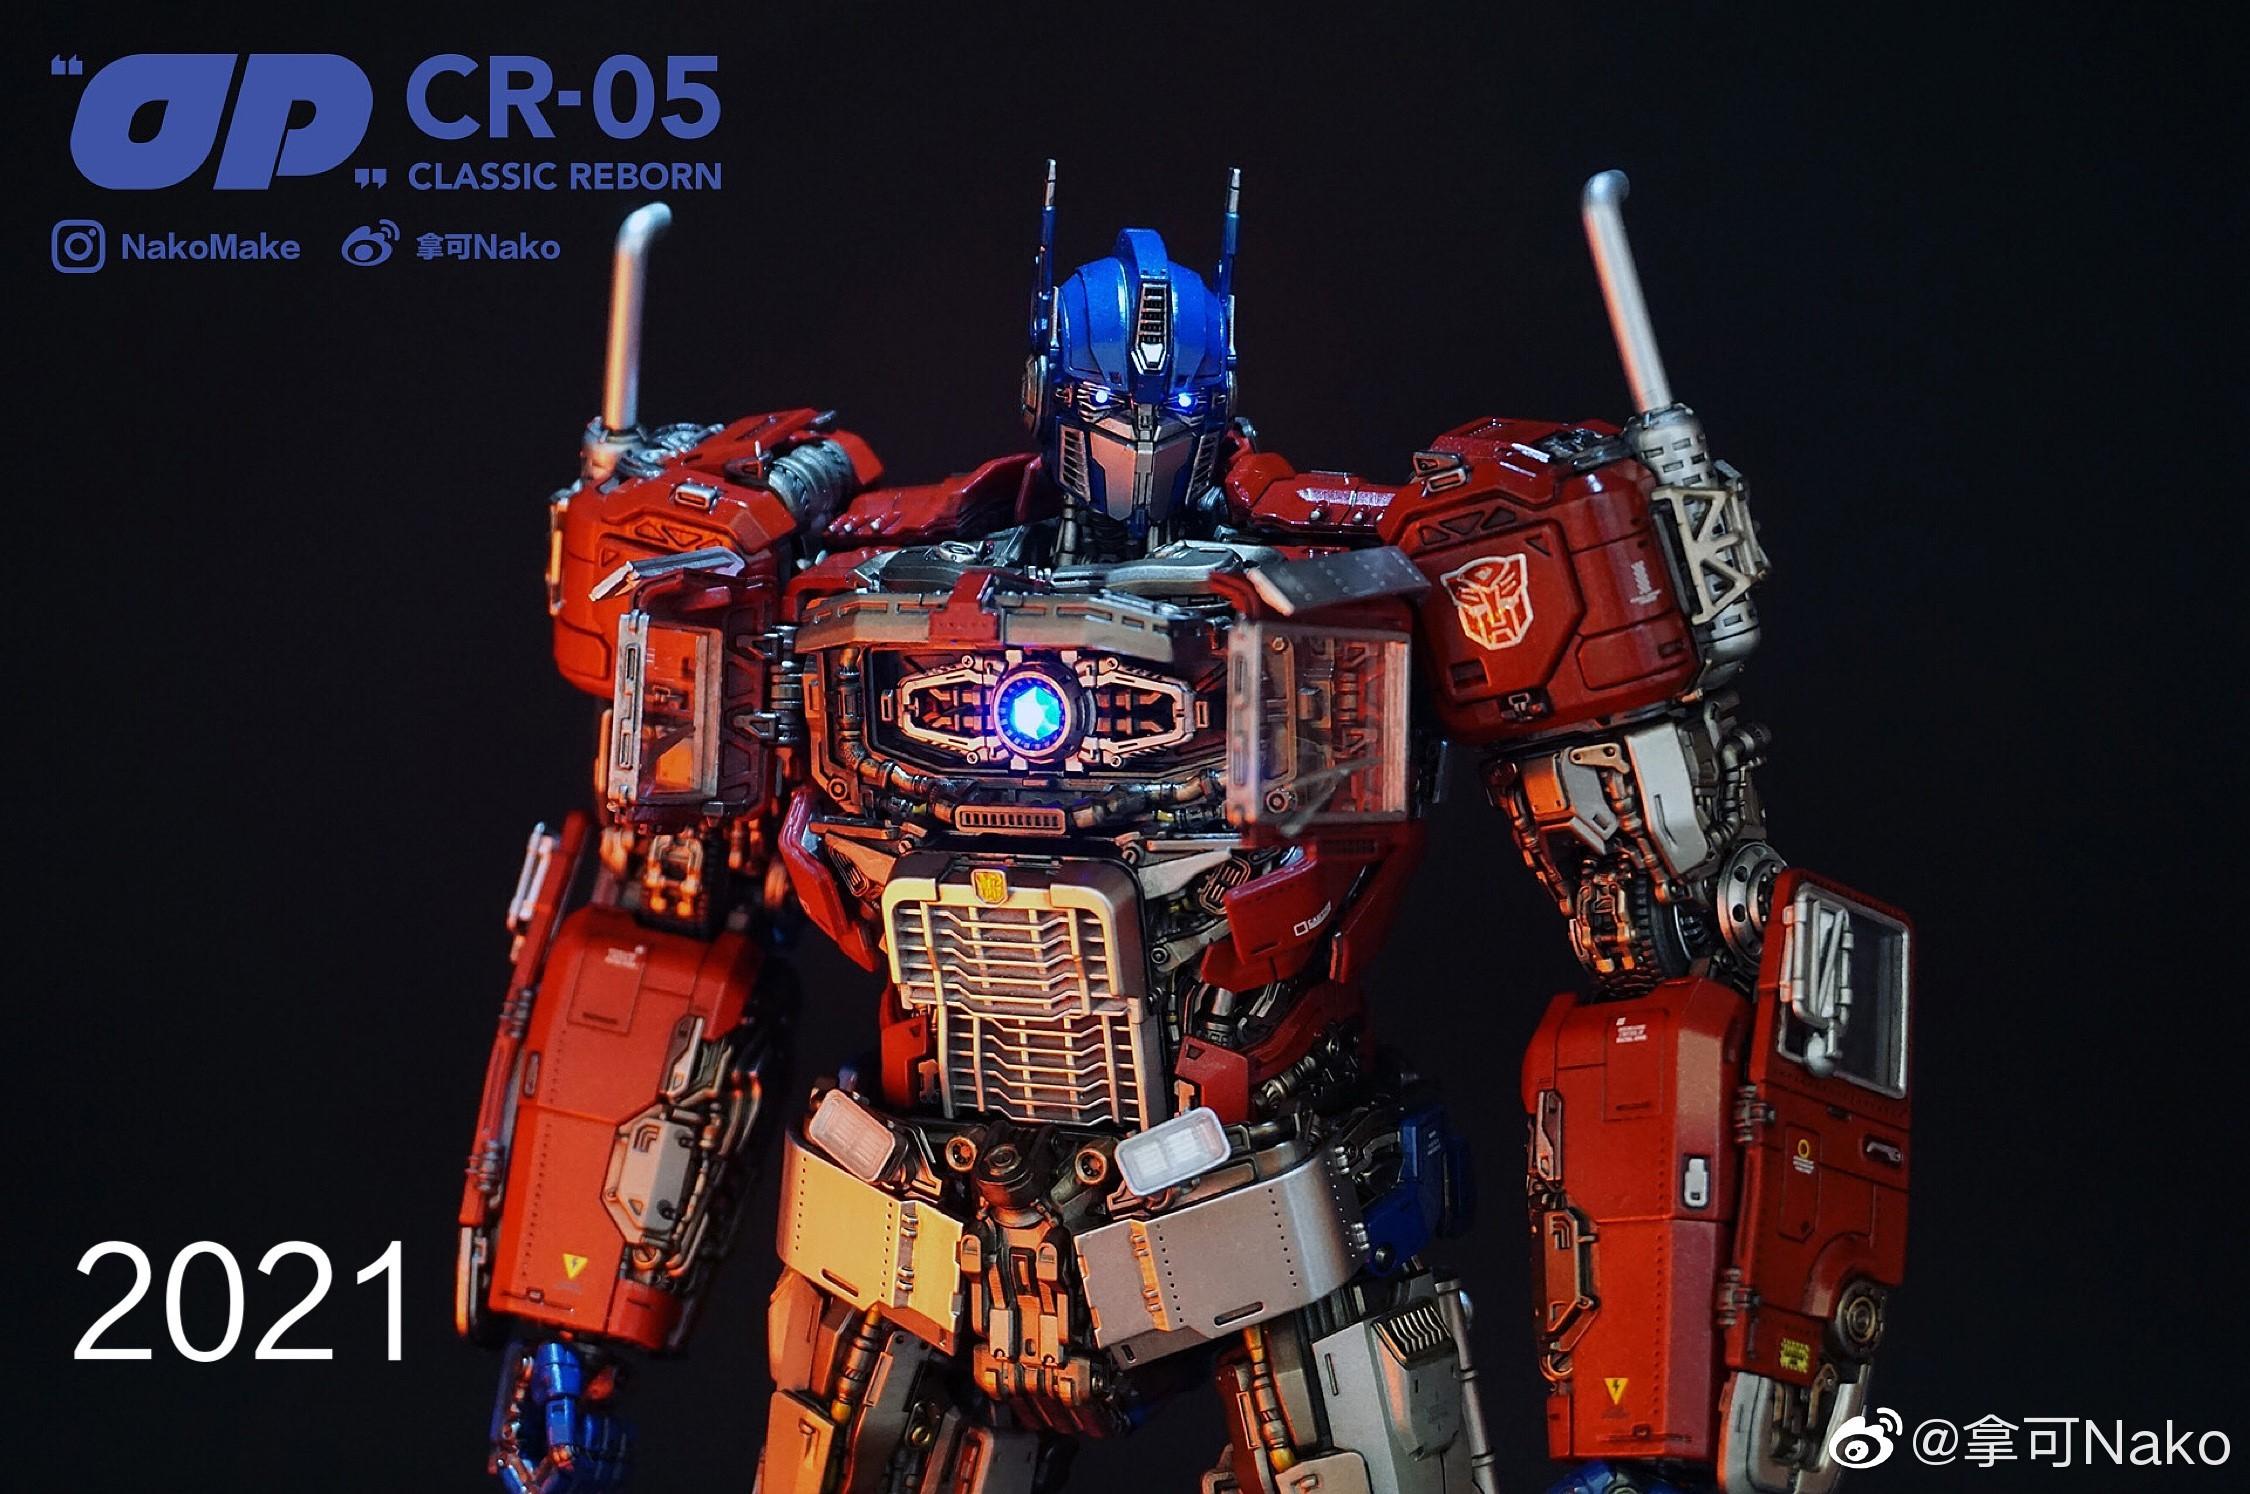 G798_NakoMake_Optimus_Prime_BUMBLEBEE_ver_GK_032 - コピー